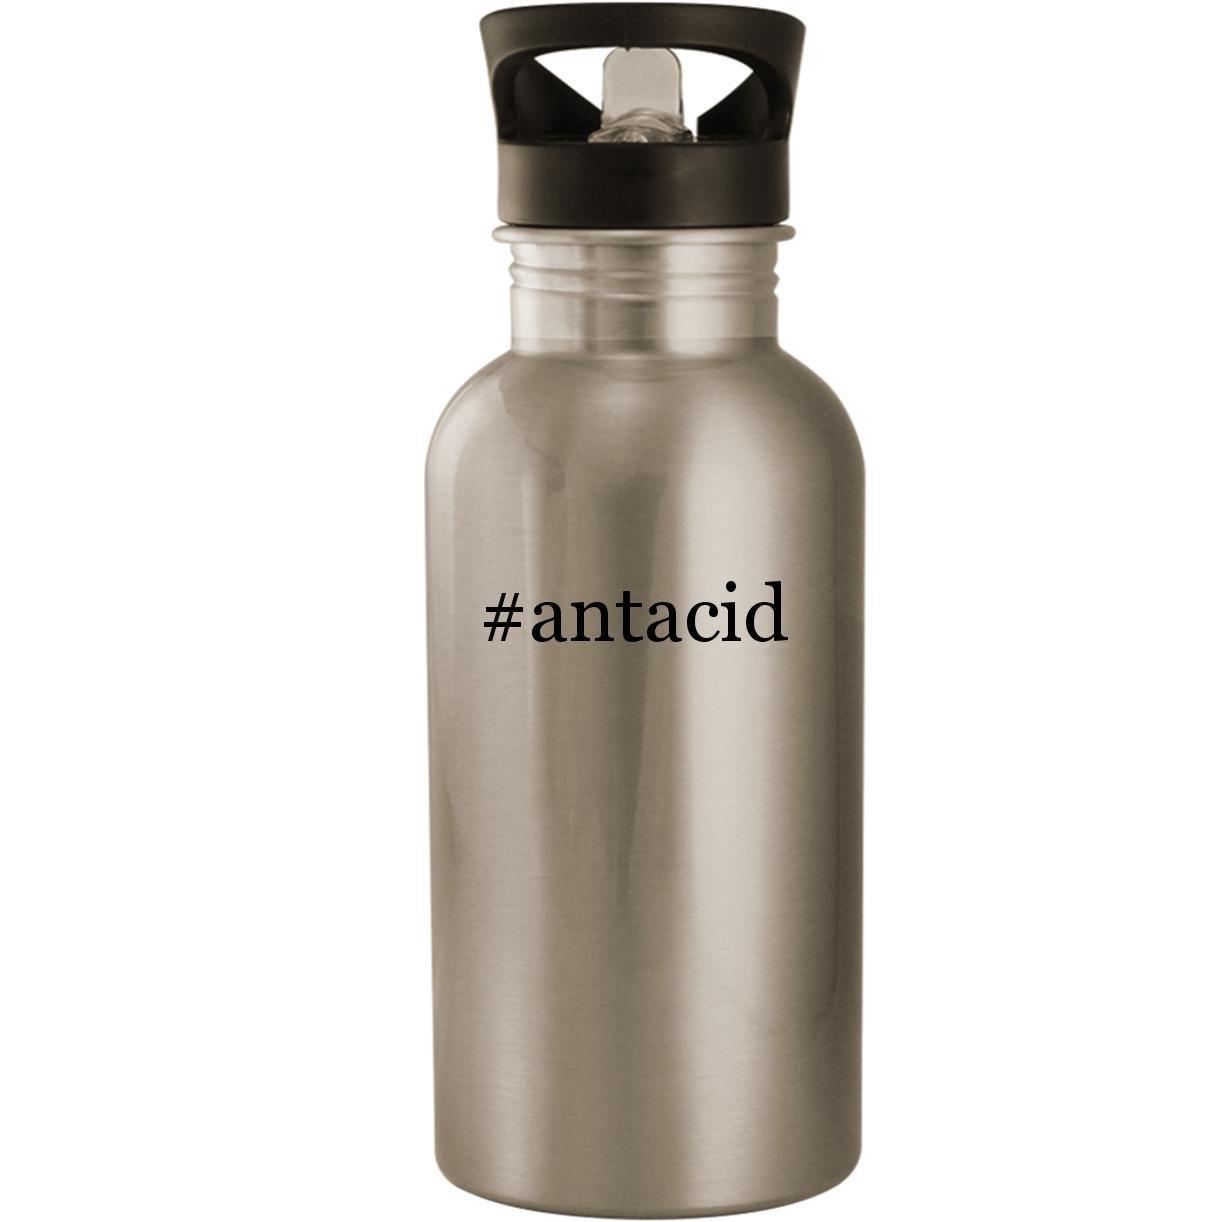 # Antacid – ステンレススチール20oz Road Ready水ボトル シルバー US-C-07-18-02-002479-04-26-18-26 B07FSZDMFN シルバー